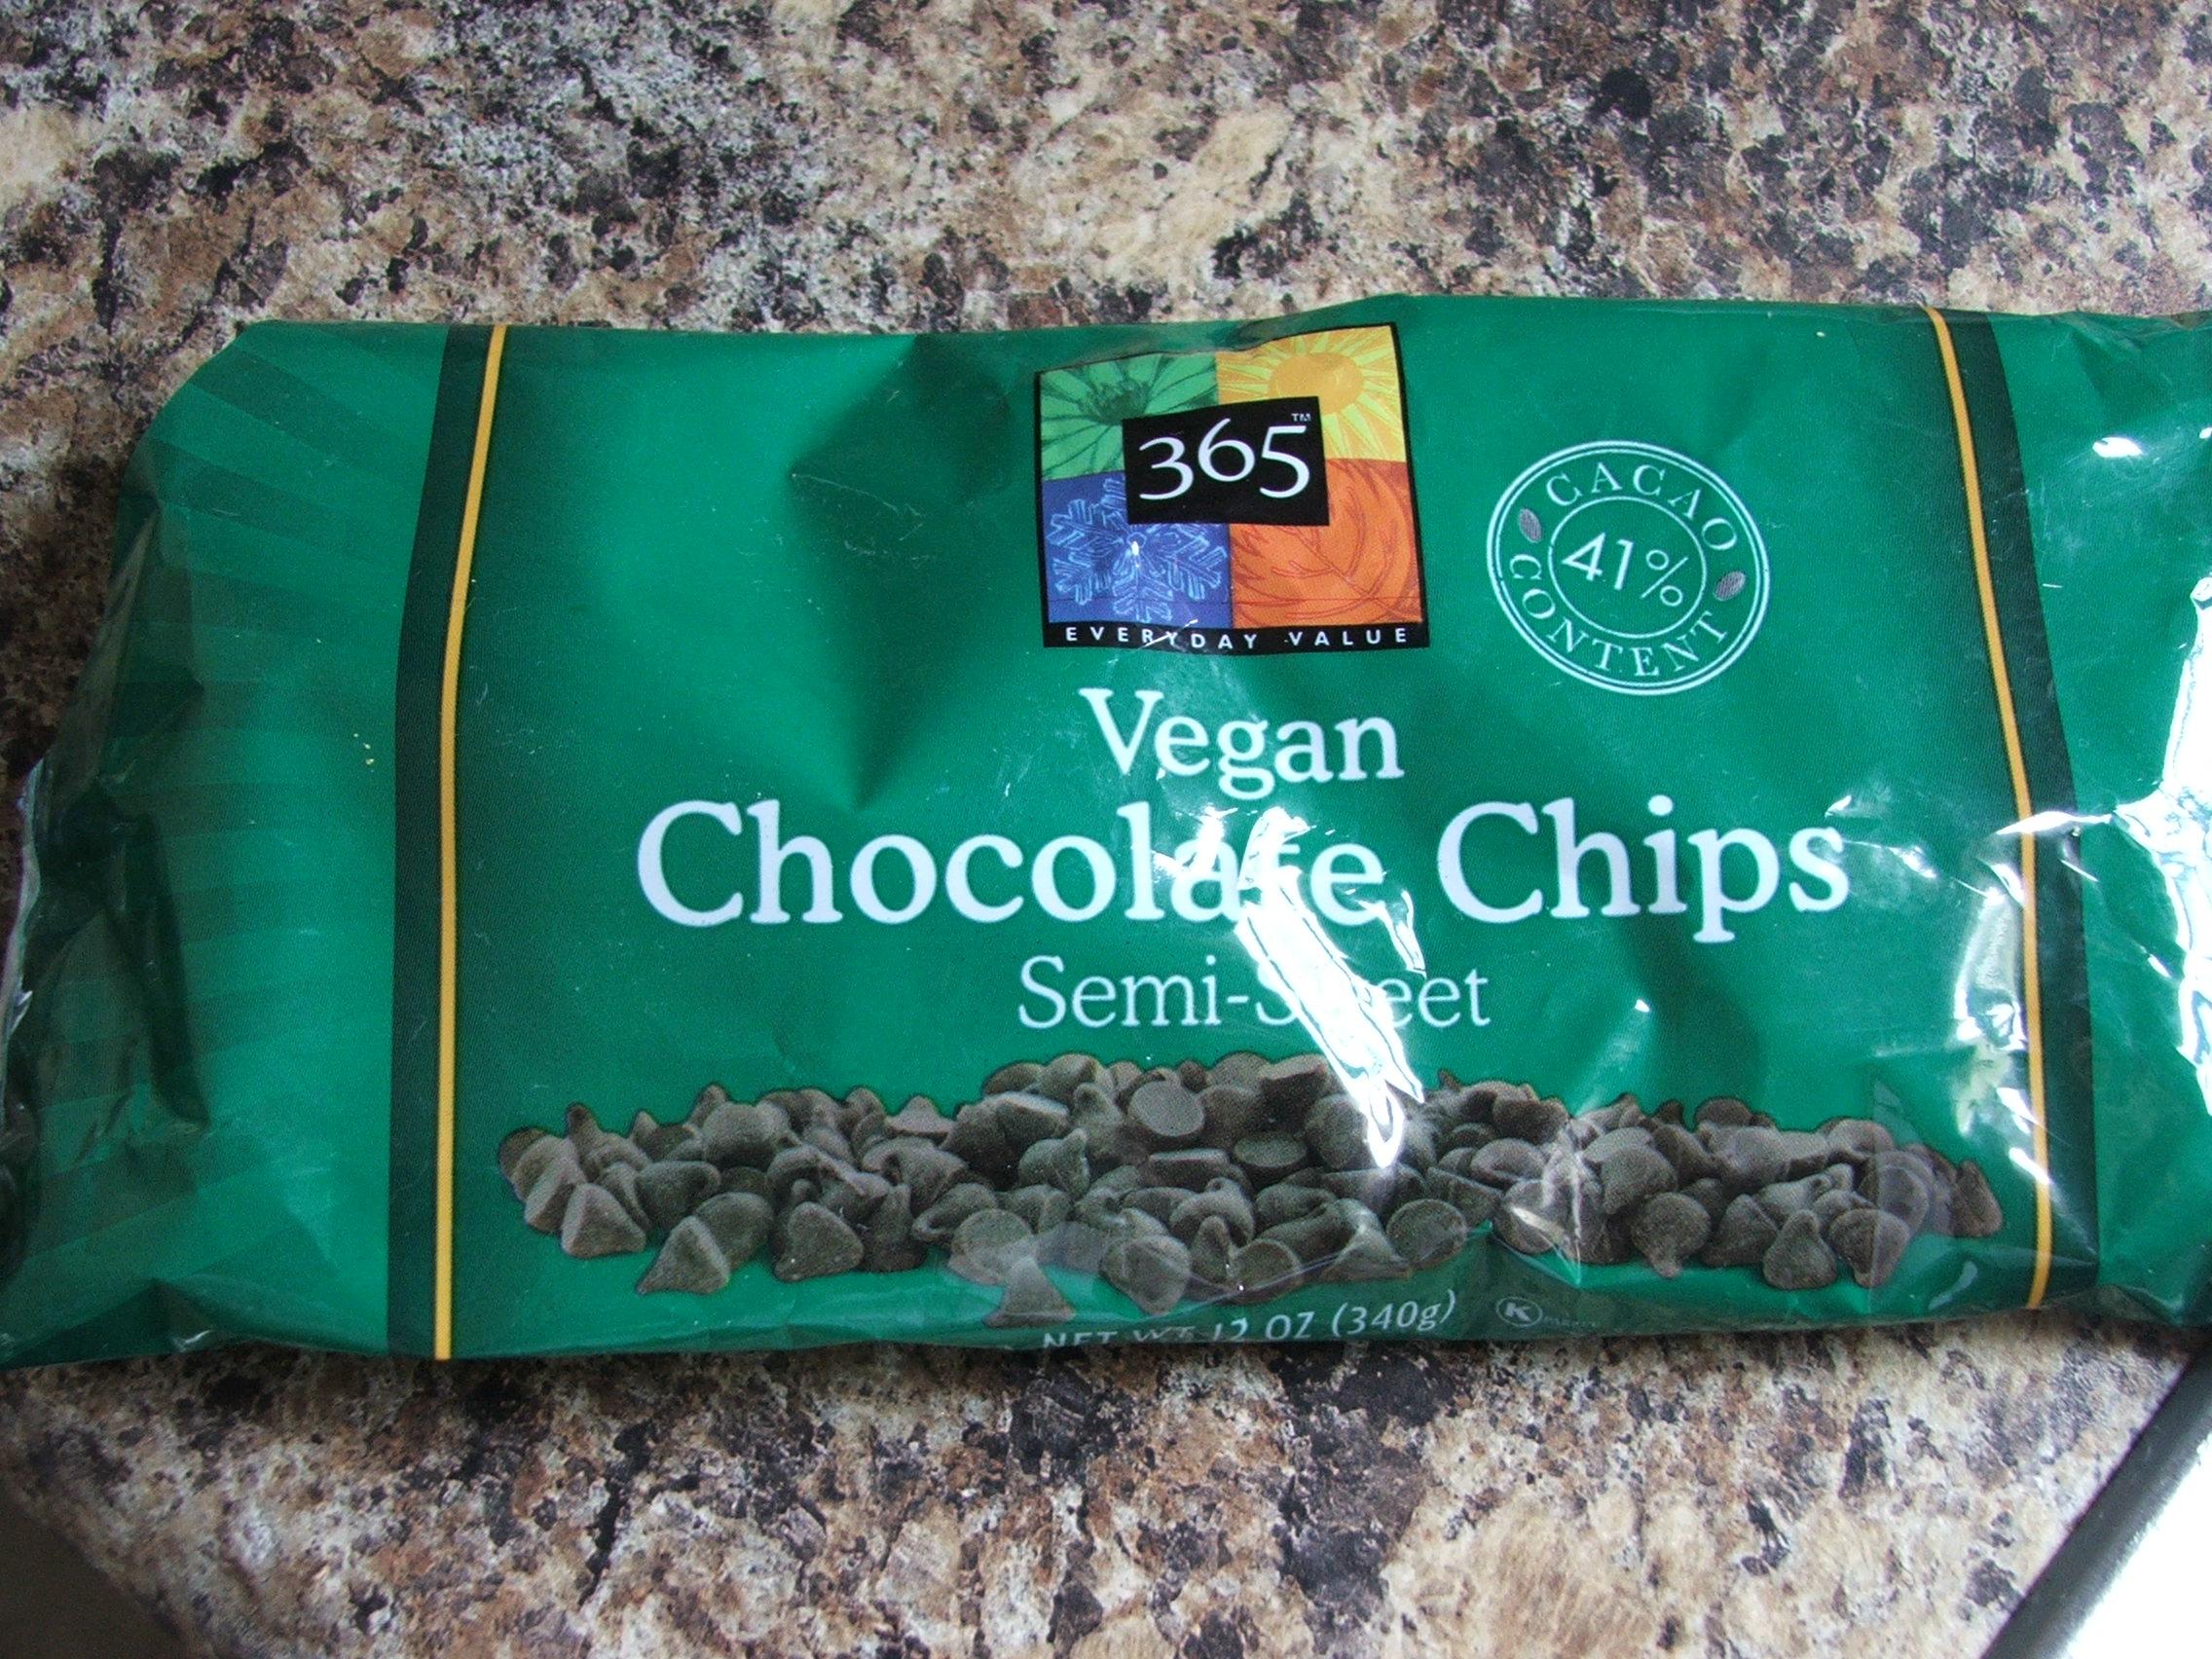 allergy-free snacks | Living the Allergic Life...to the Fullest!